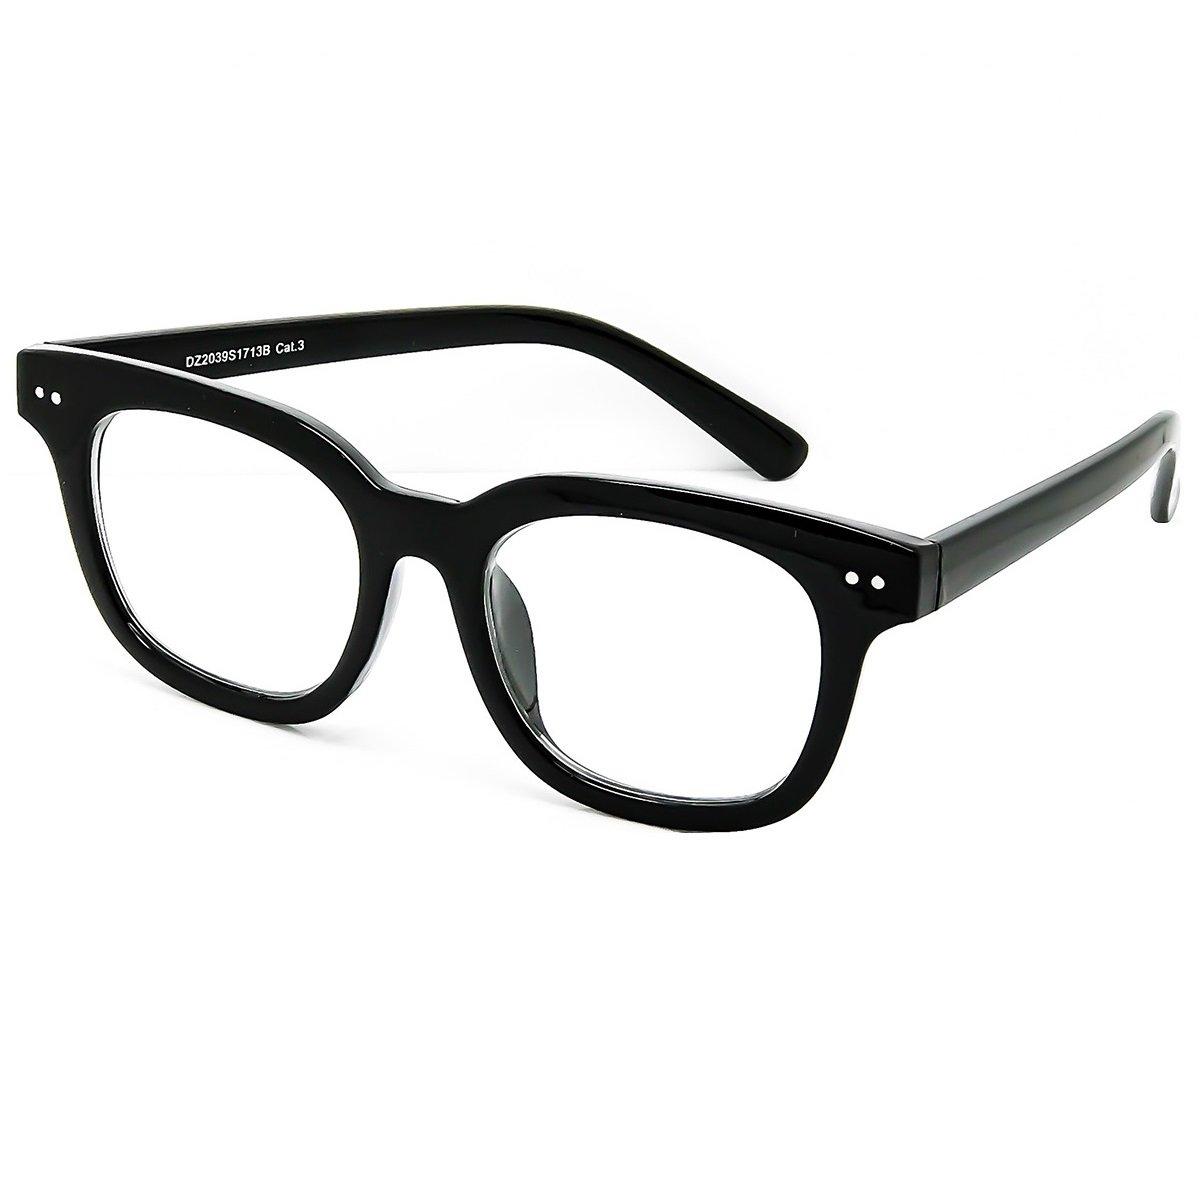 Kiss Brillen in neutralen STIL MOSCOT mod. BOXER - herren damen ...